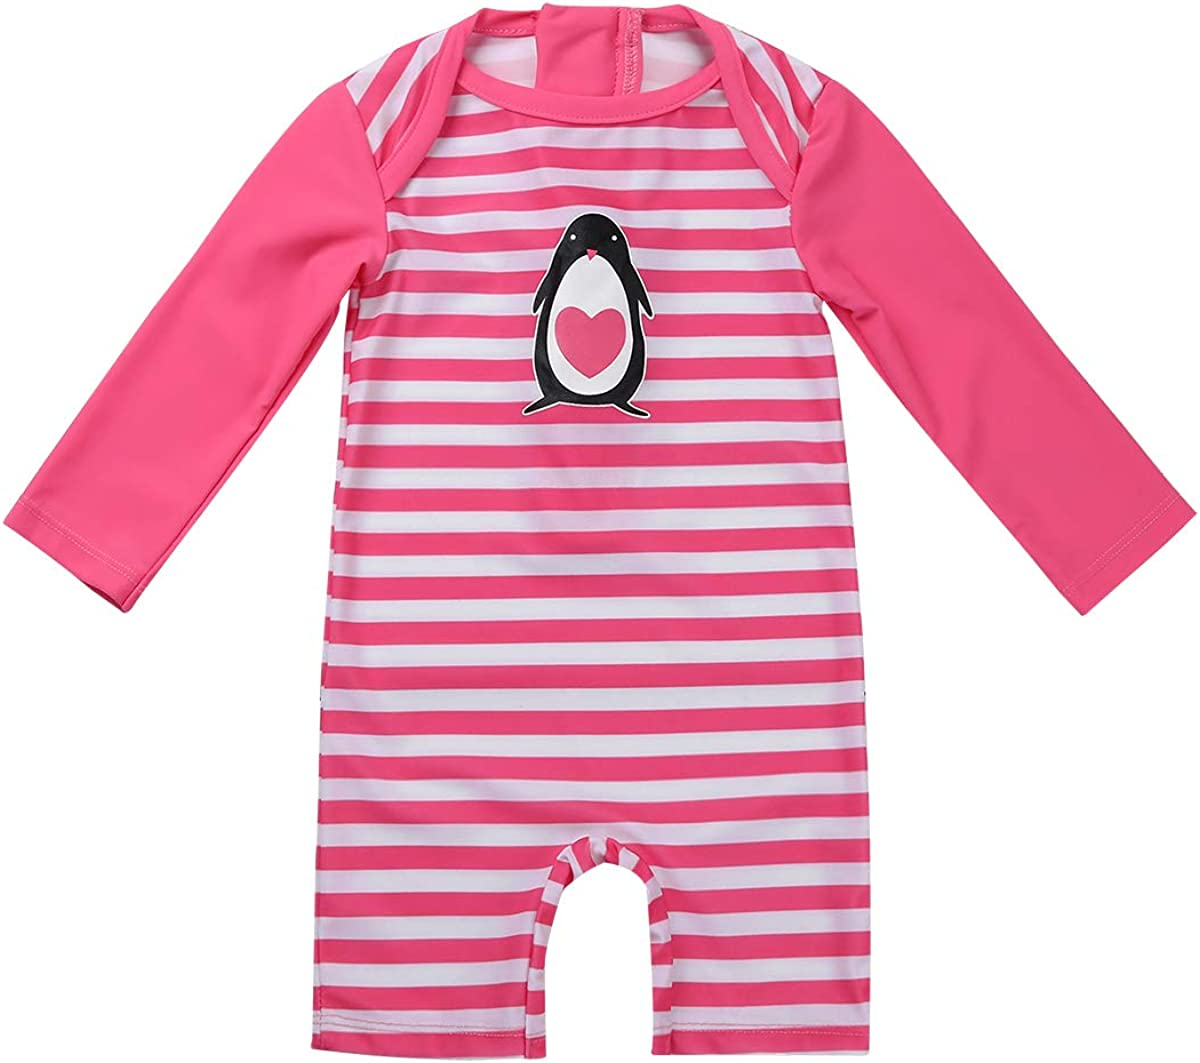 National uniform free shipping Agoky Baby Girls One Piece Striped Swimsuit Sun Rash Zip Guard Low price P